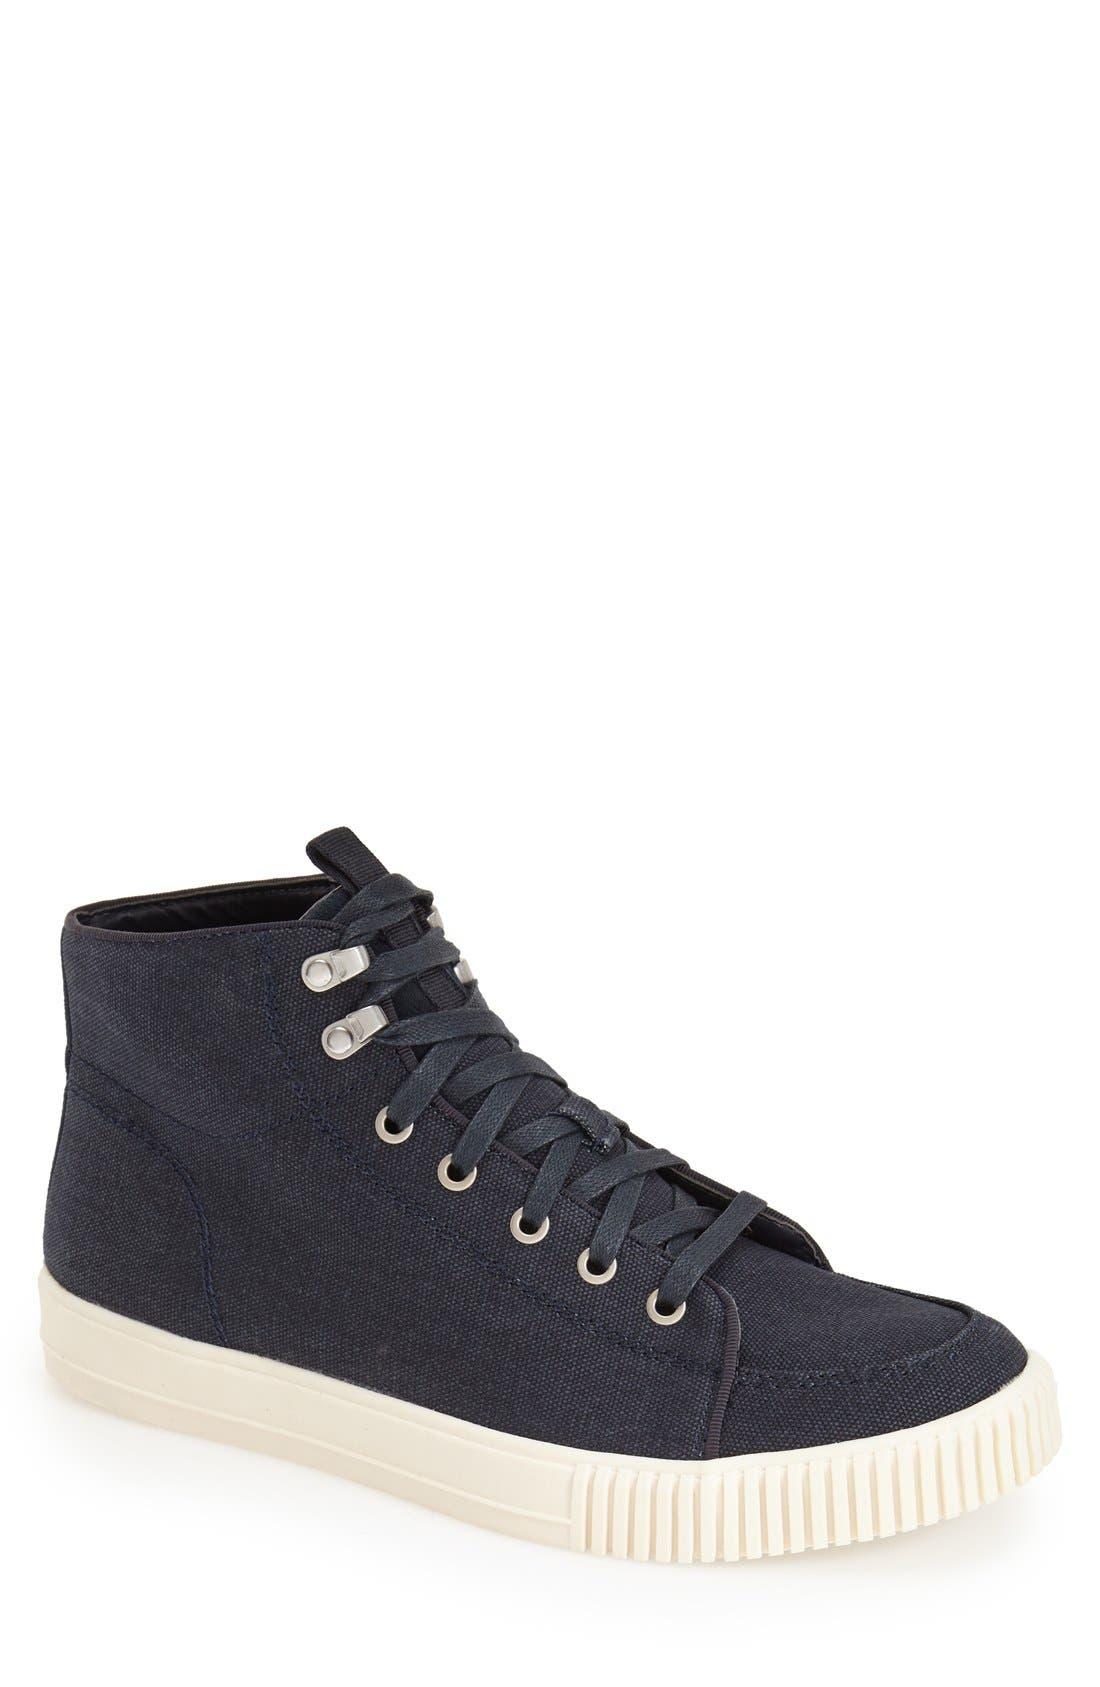 Alternate Image 1 Selected - Calvin Klein Jeans 'Jenson' Sneaker (Men)